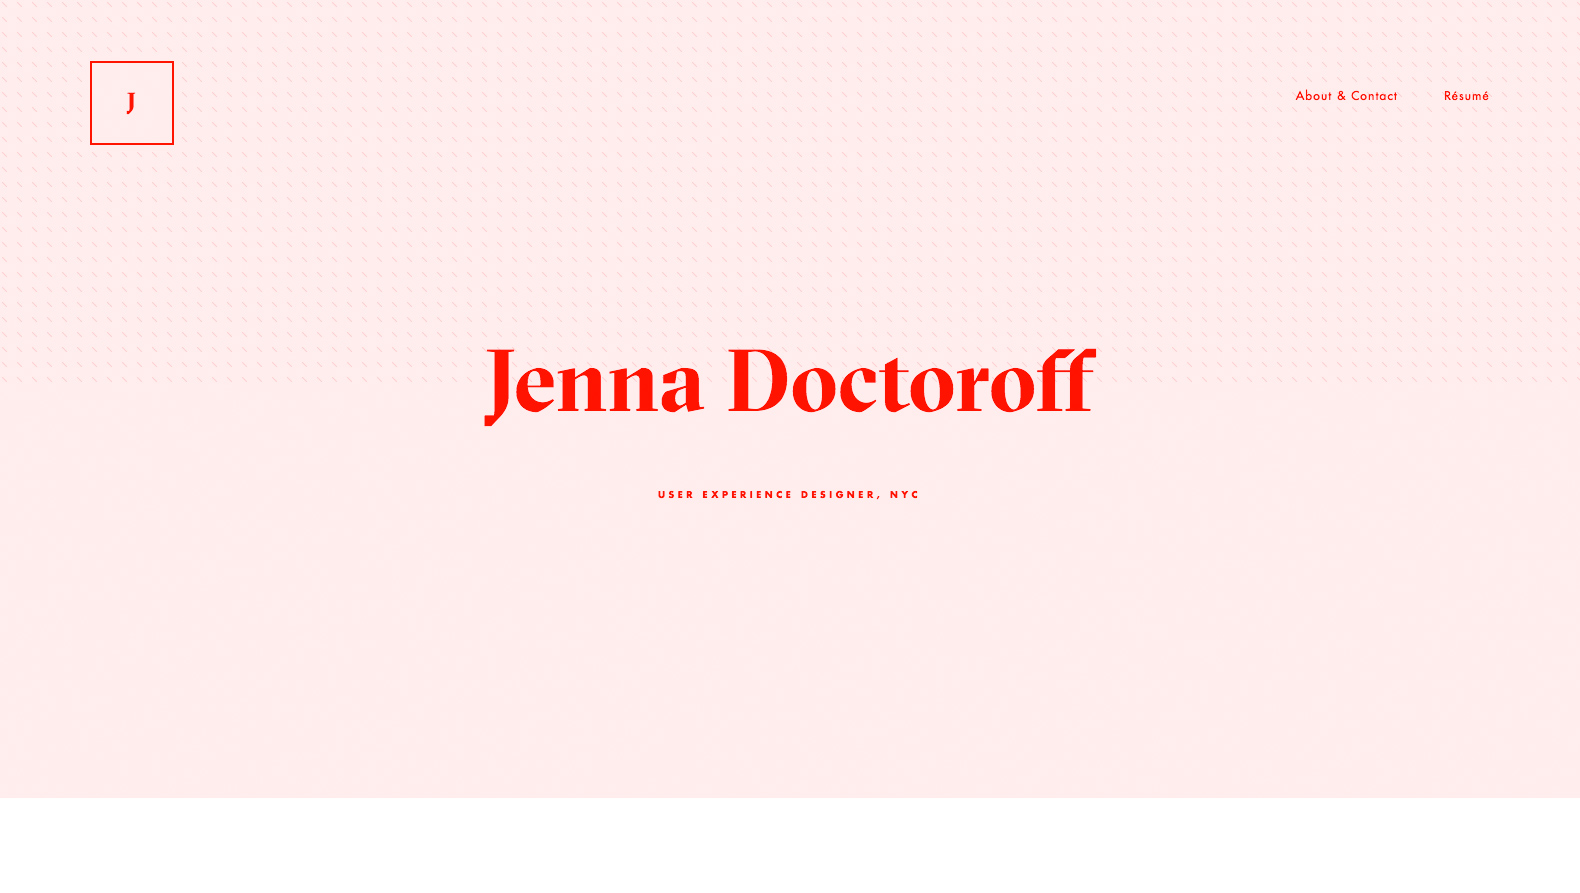 Jenna Doctoroff